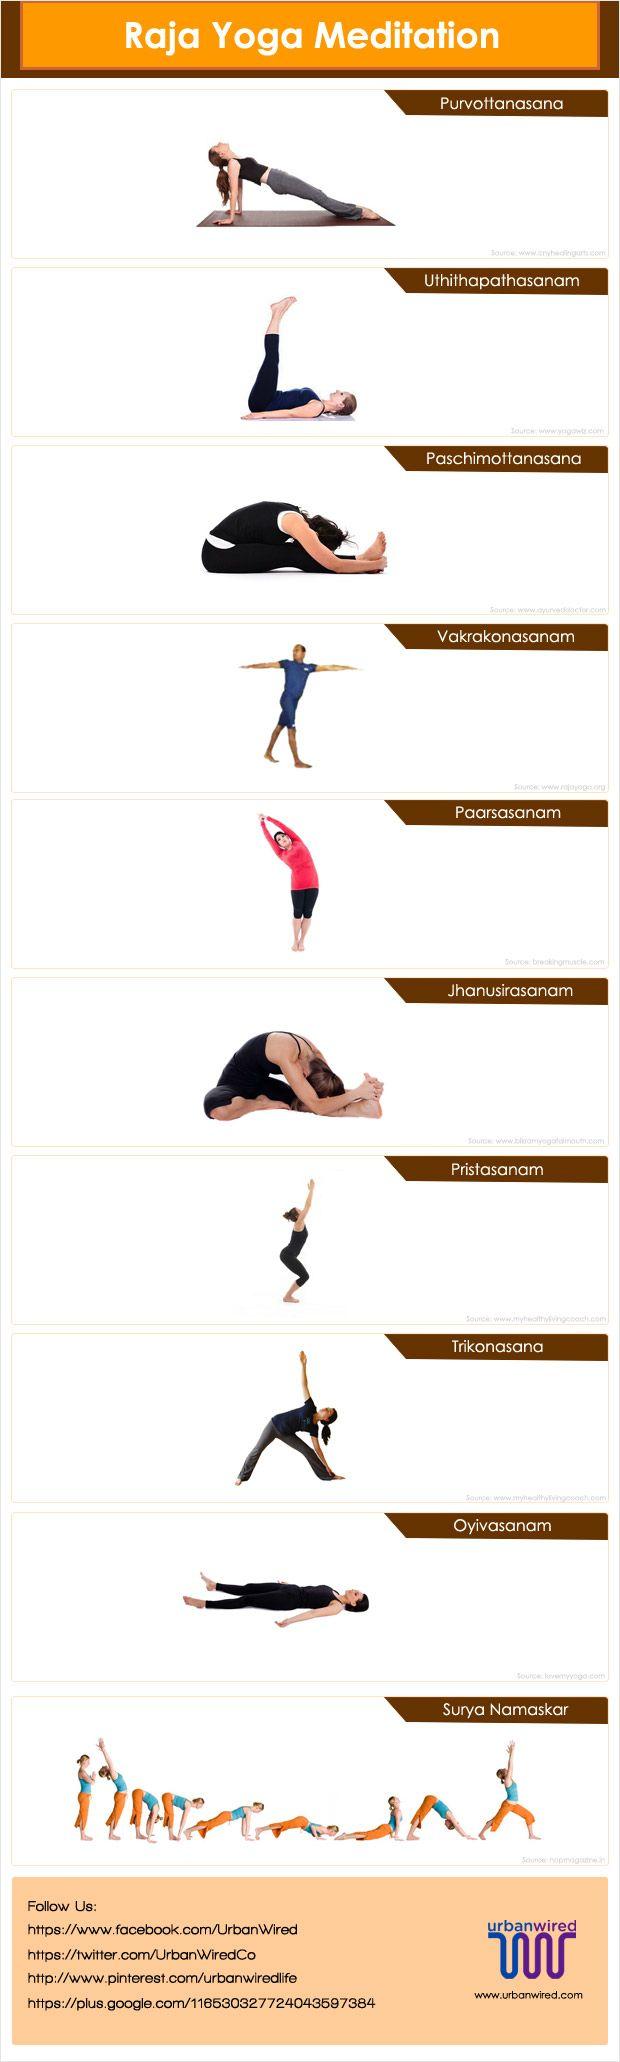 Raja Yoga Meditation Poses